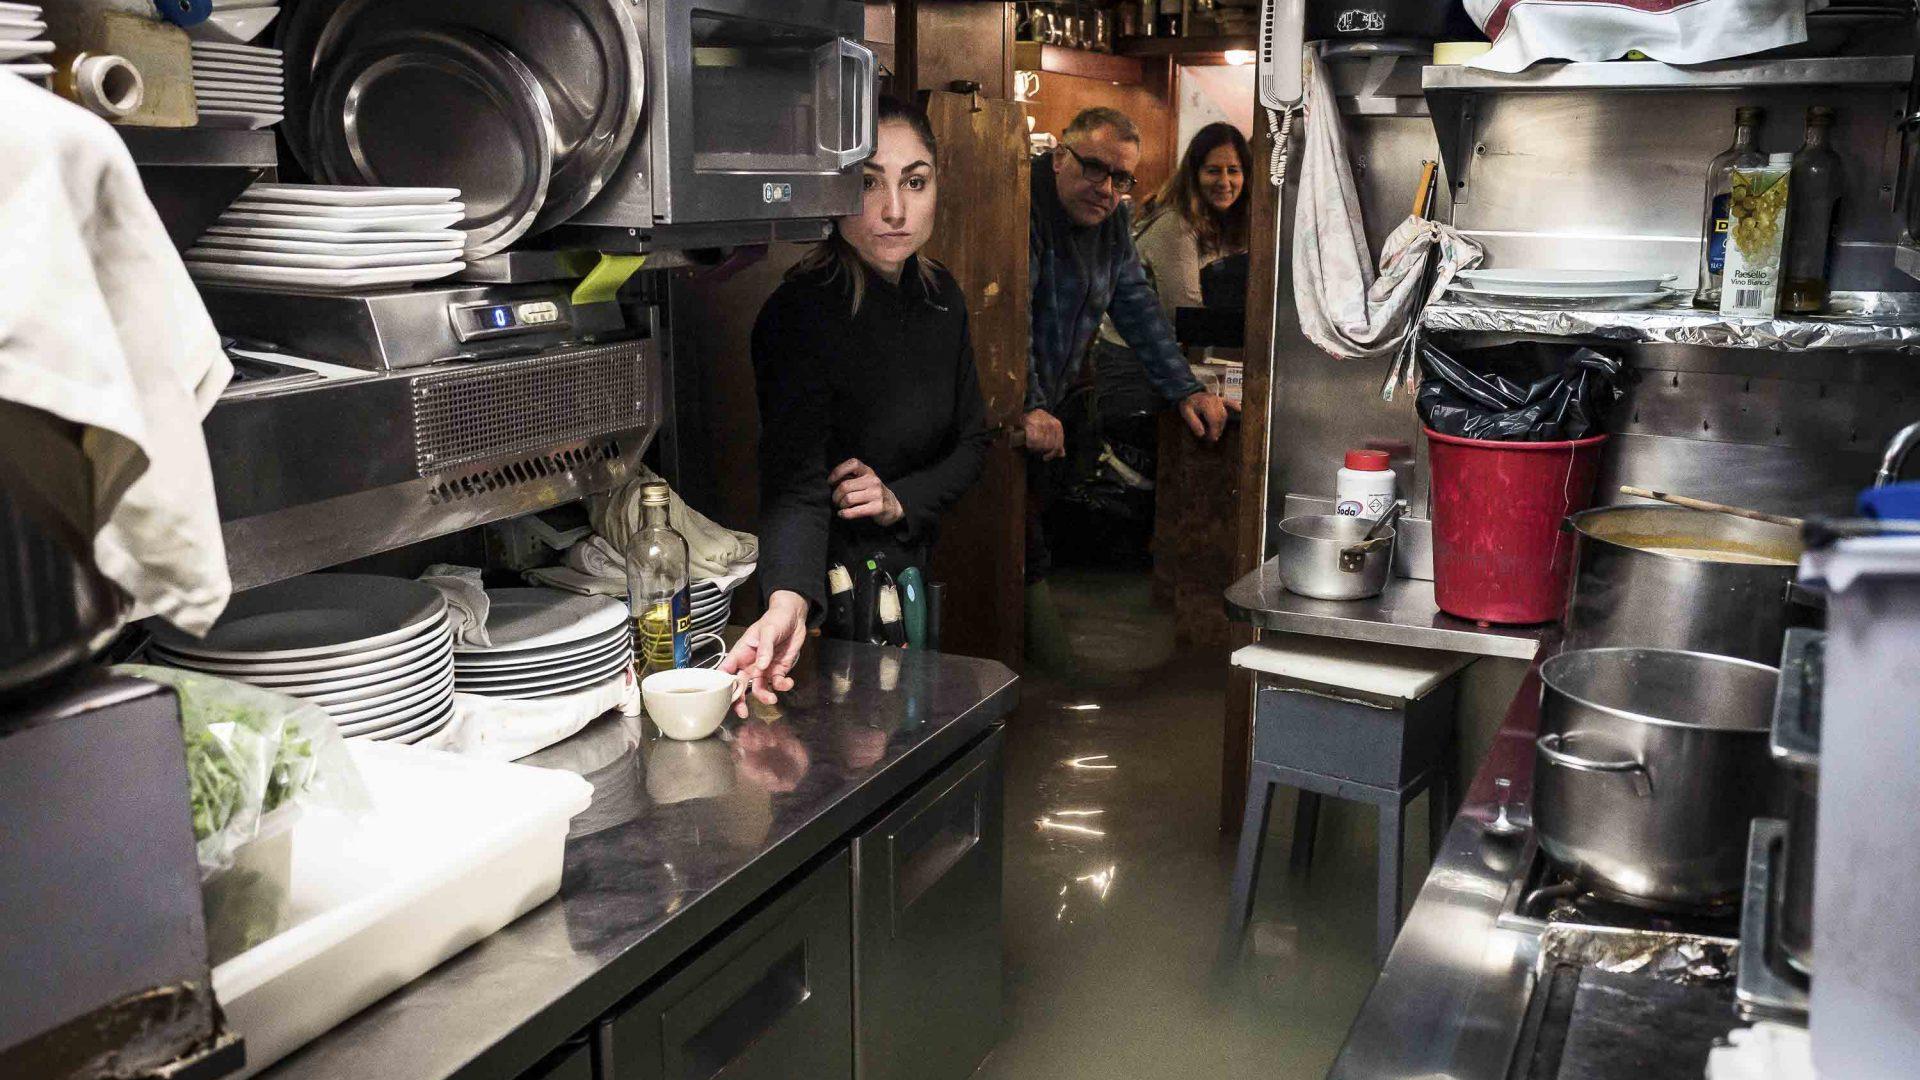 A flooded restaurant kitchen in Venice.